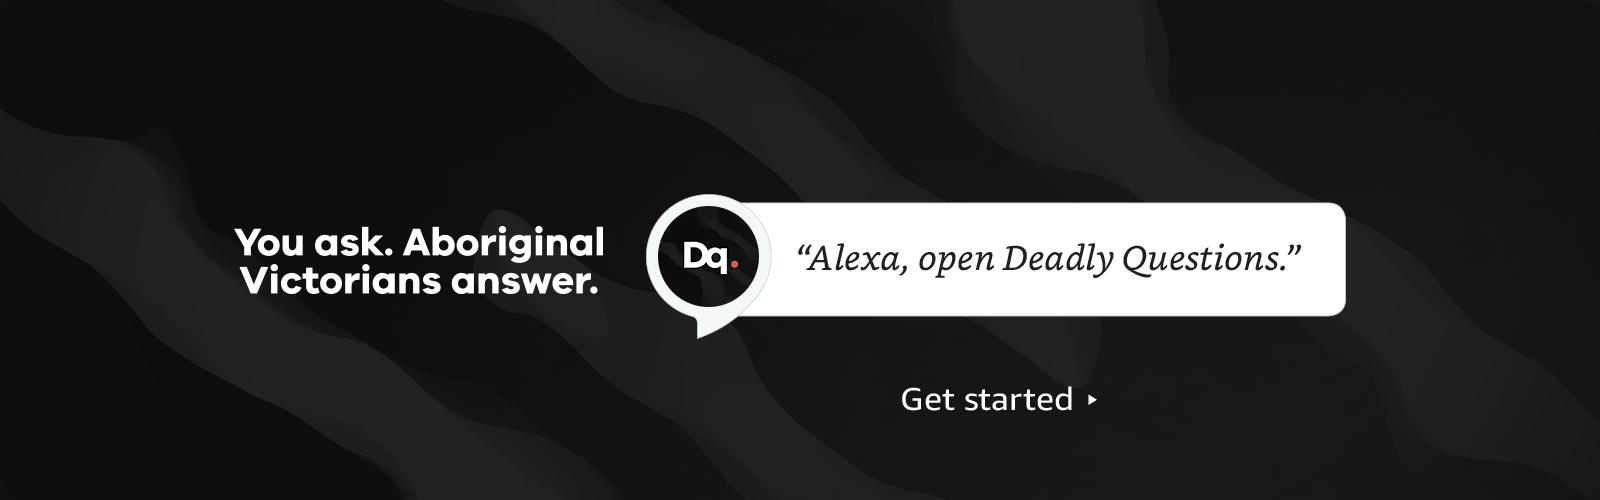 """Alexa, open Deadly Questions"""